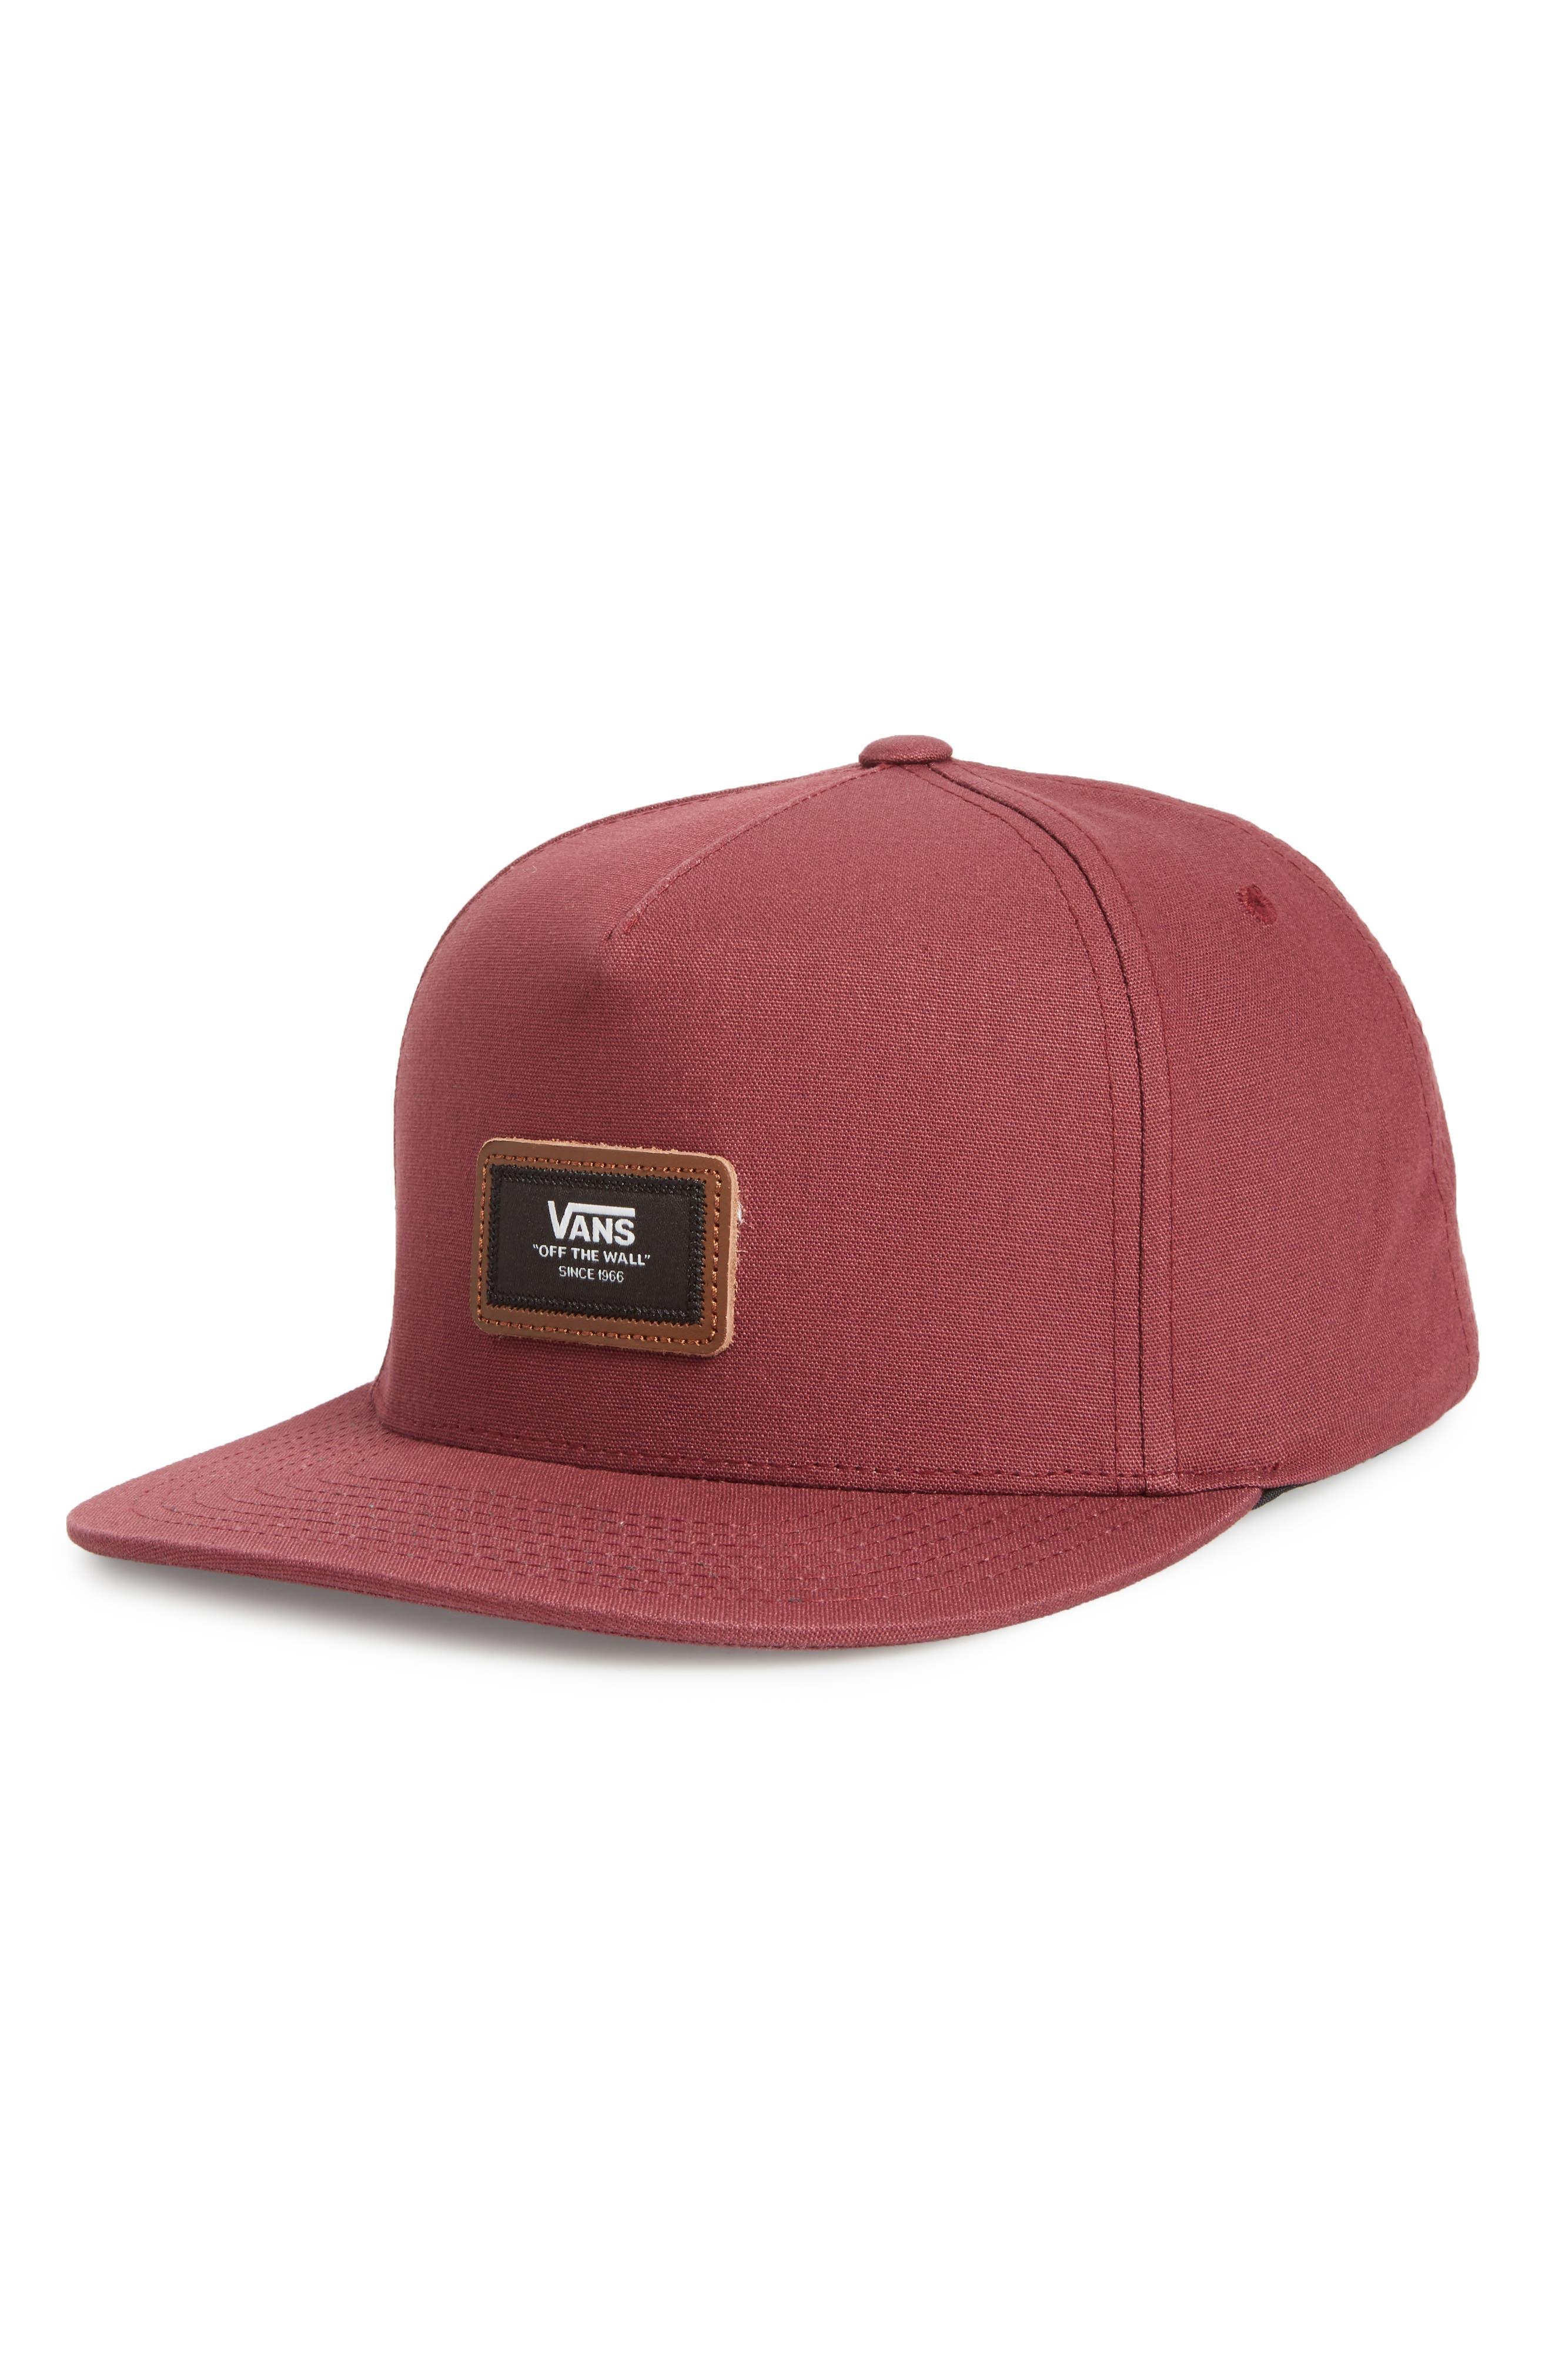 Fiske Snapback Cap,                         Main,                         color, Port Royale